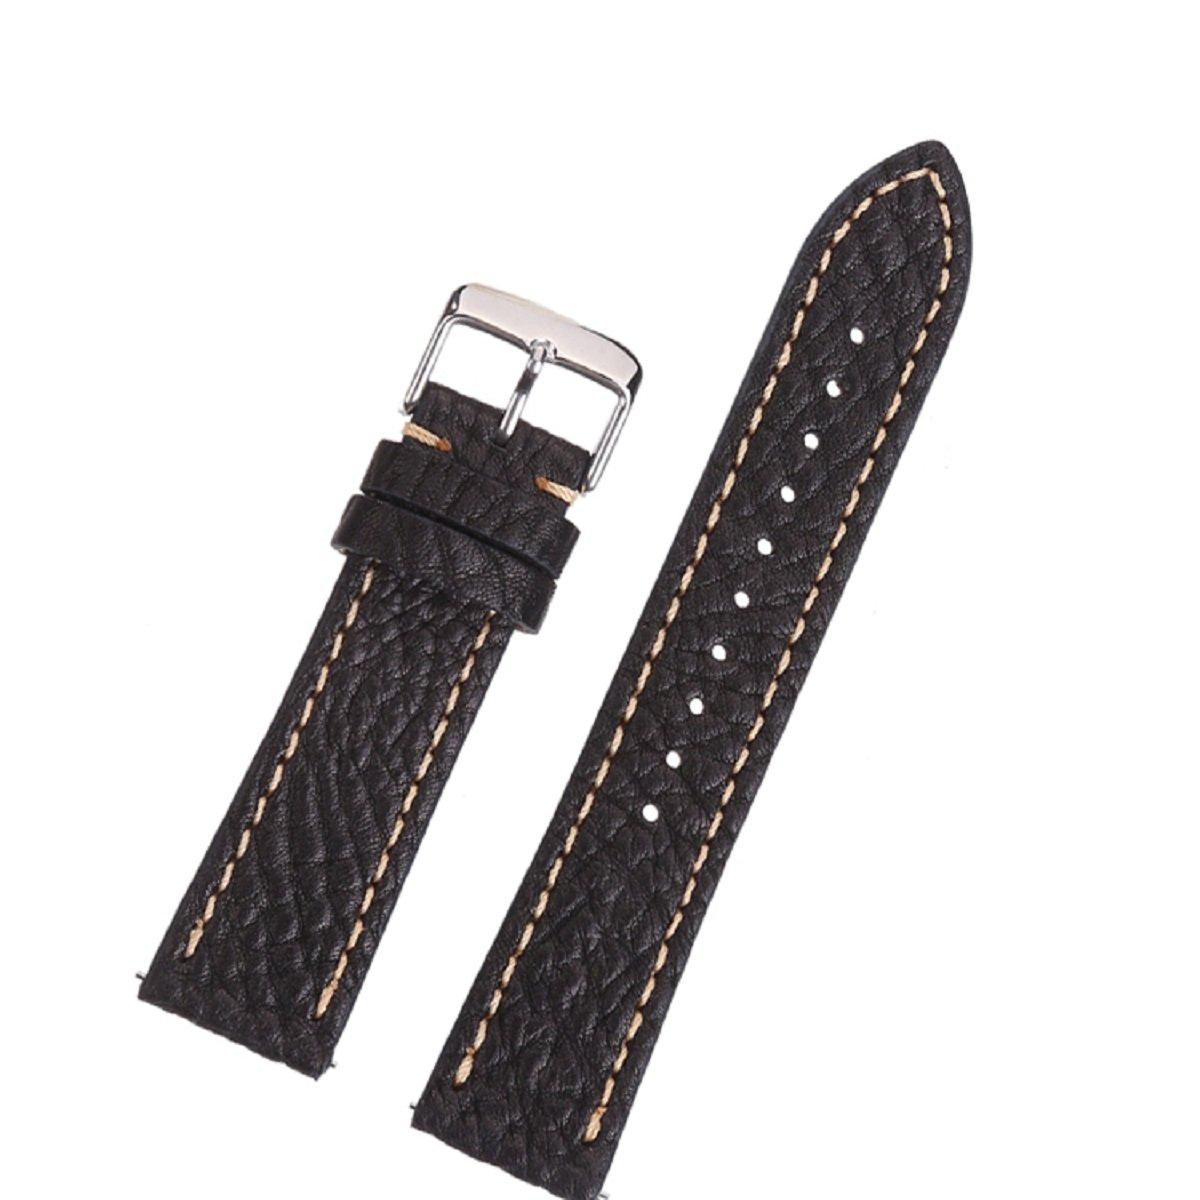 EACHE 本革腕時計バンド クイックリリーススプリングバー付き (豊富な色とサイズ) 20mm Lichee Black 20mm|Lichee Black Lichee Black 20mm B076H1HYHV